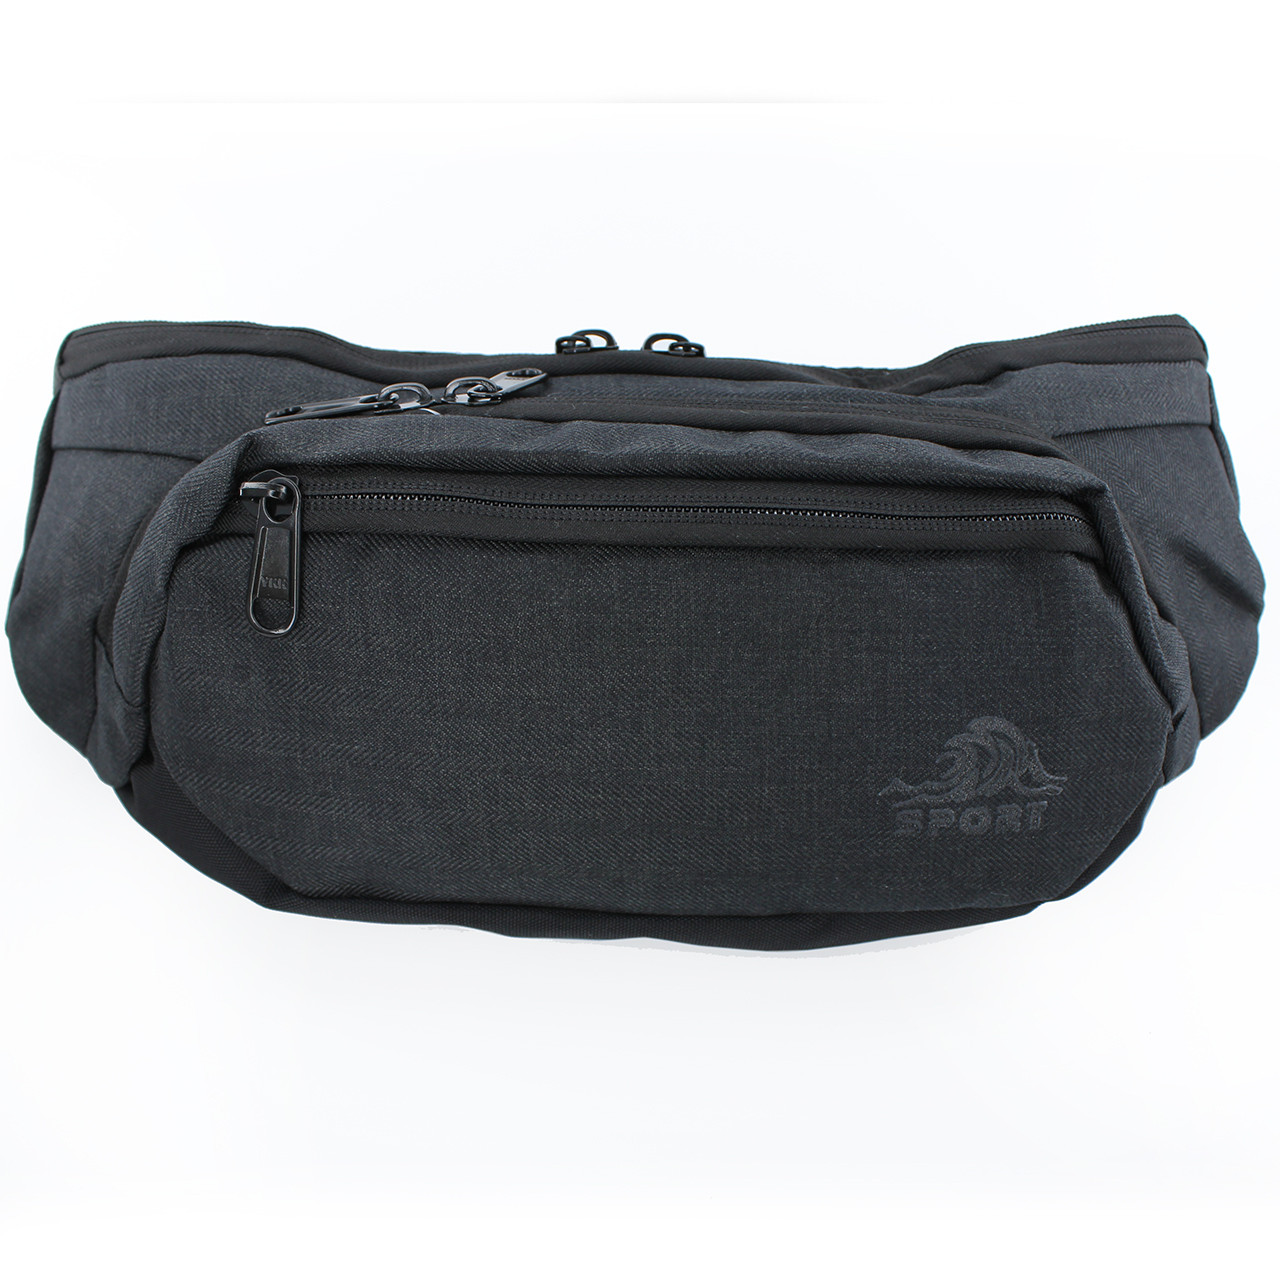 Чорна сумочка на пояс Sport, бананка